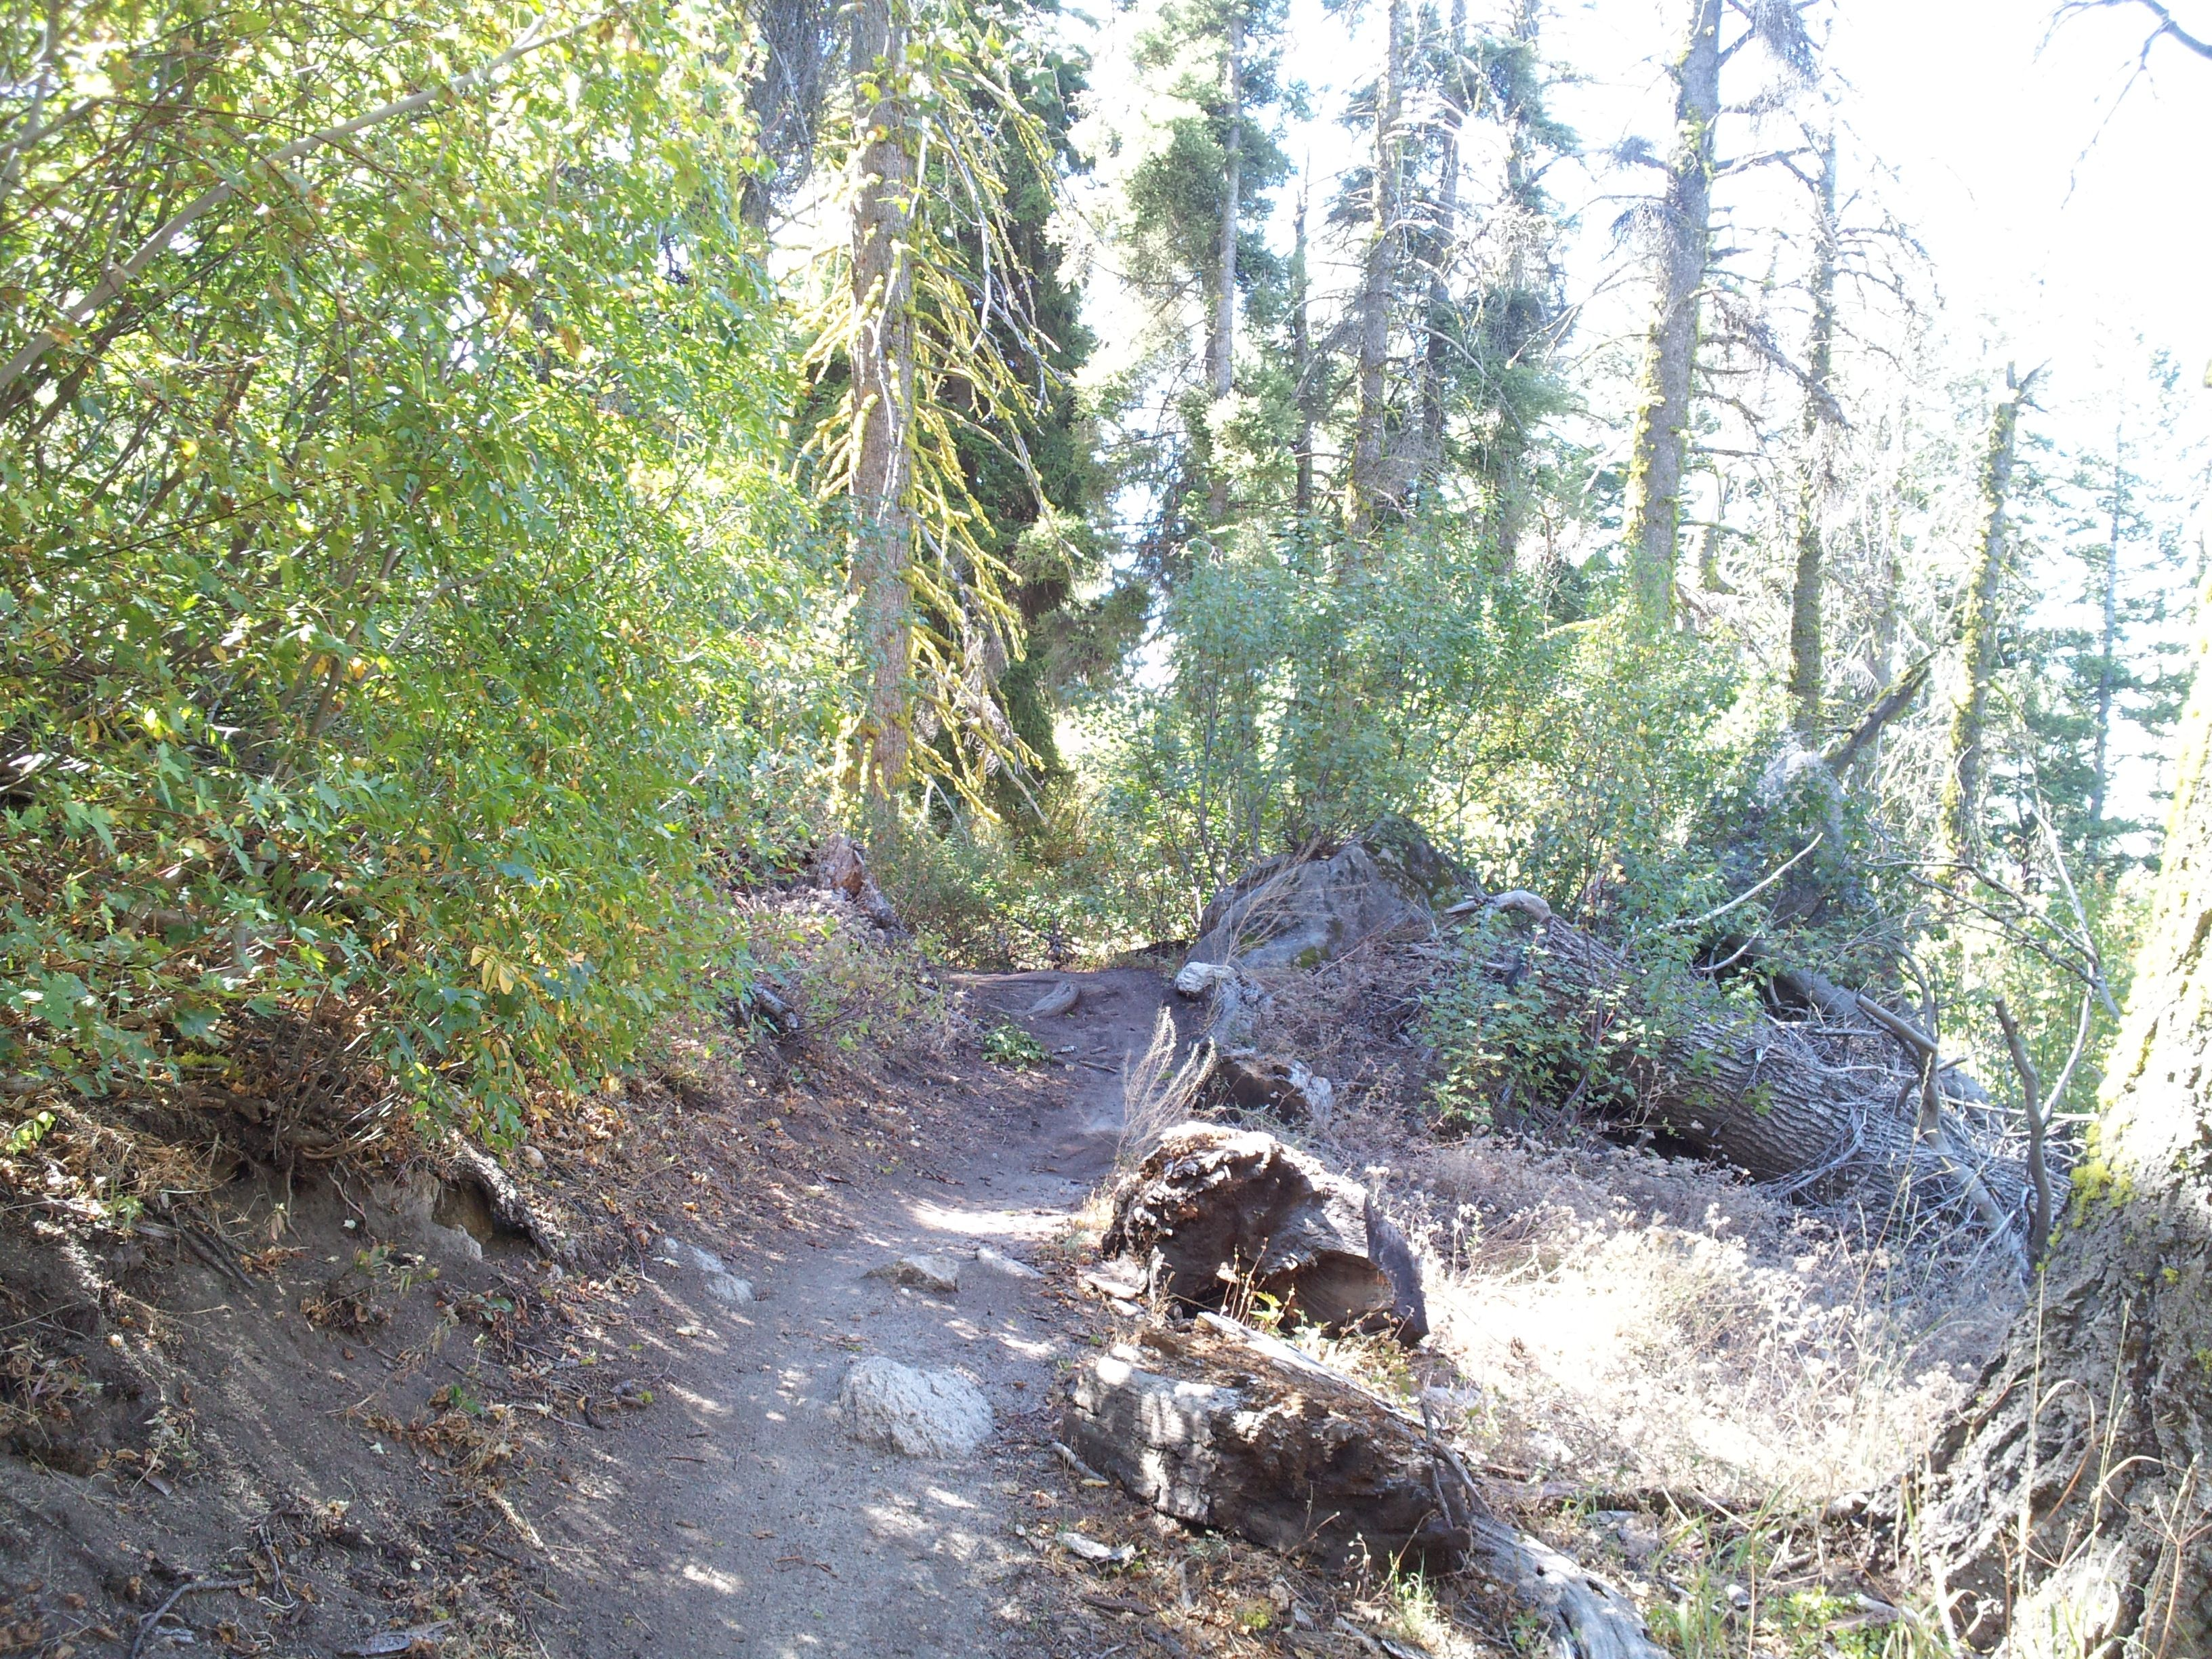 Pin by teresa cook on mtn biking mountain trails idaho